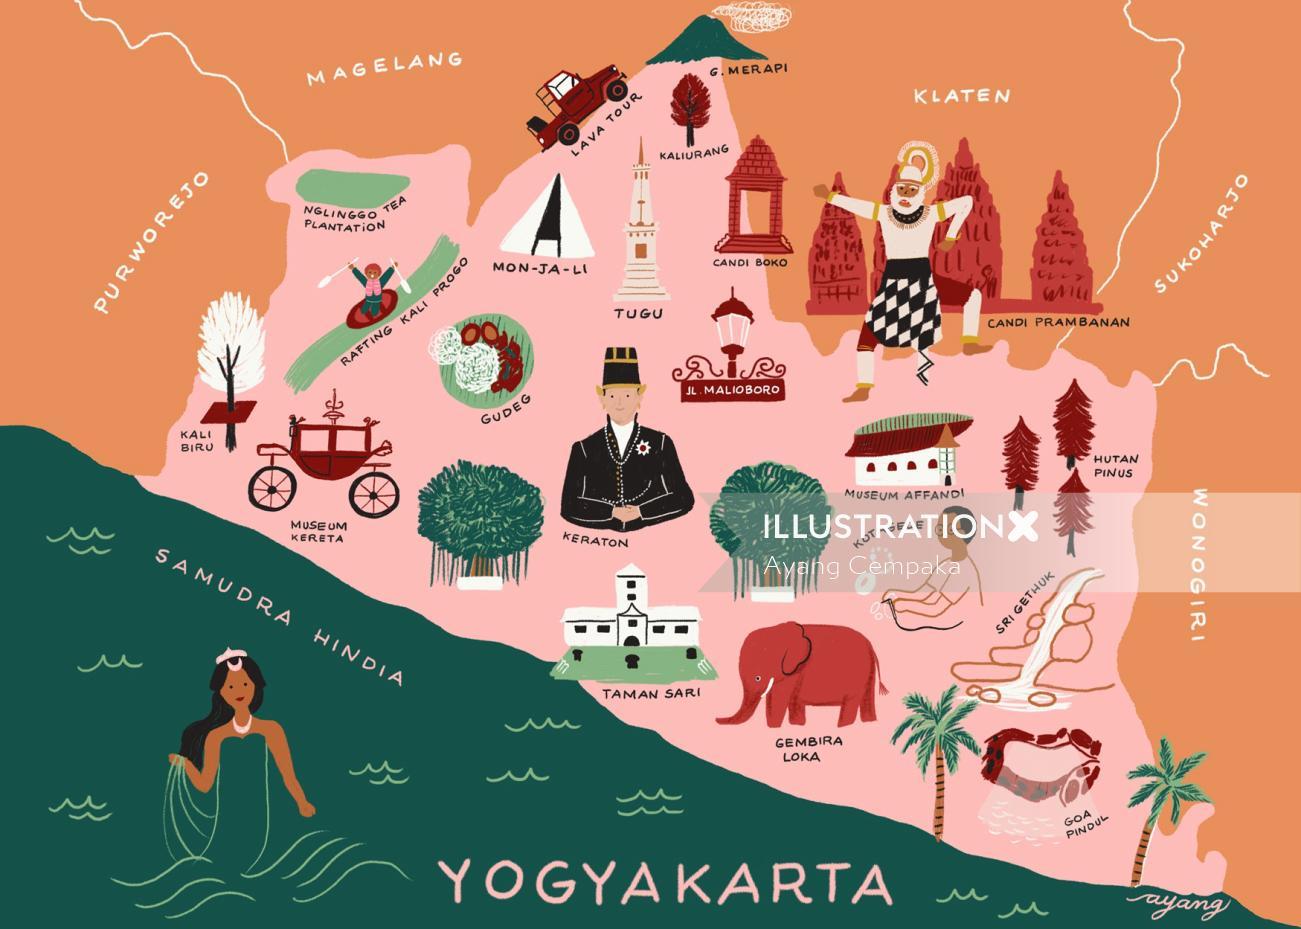 Map illustration of Yogyakarta by Ayang Cempaka